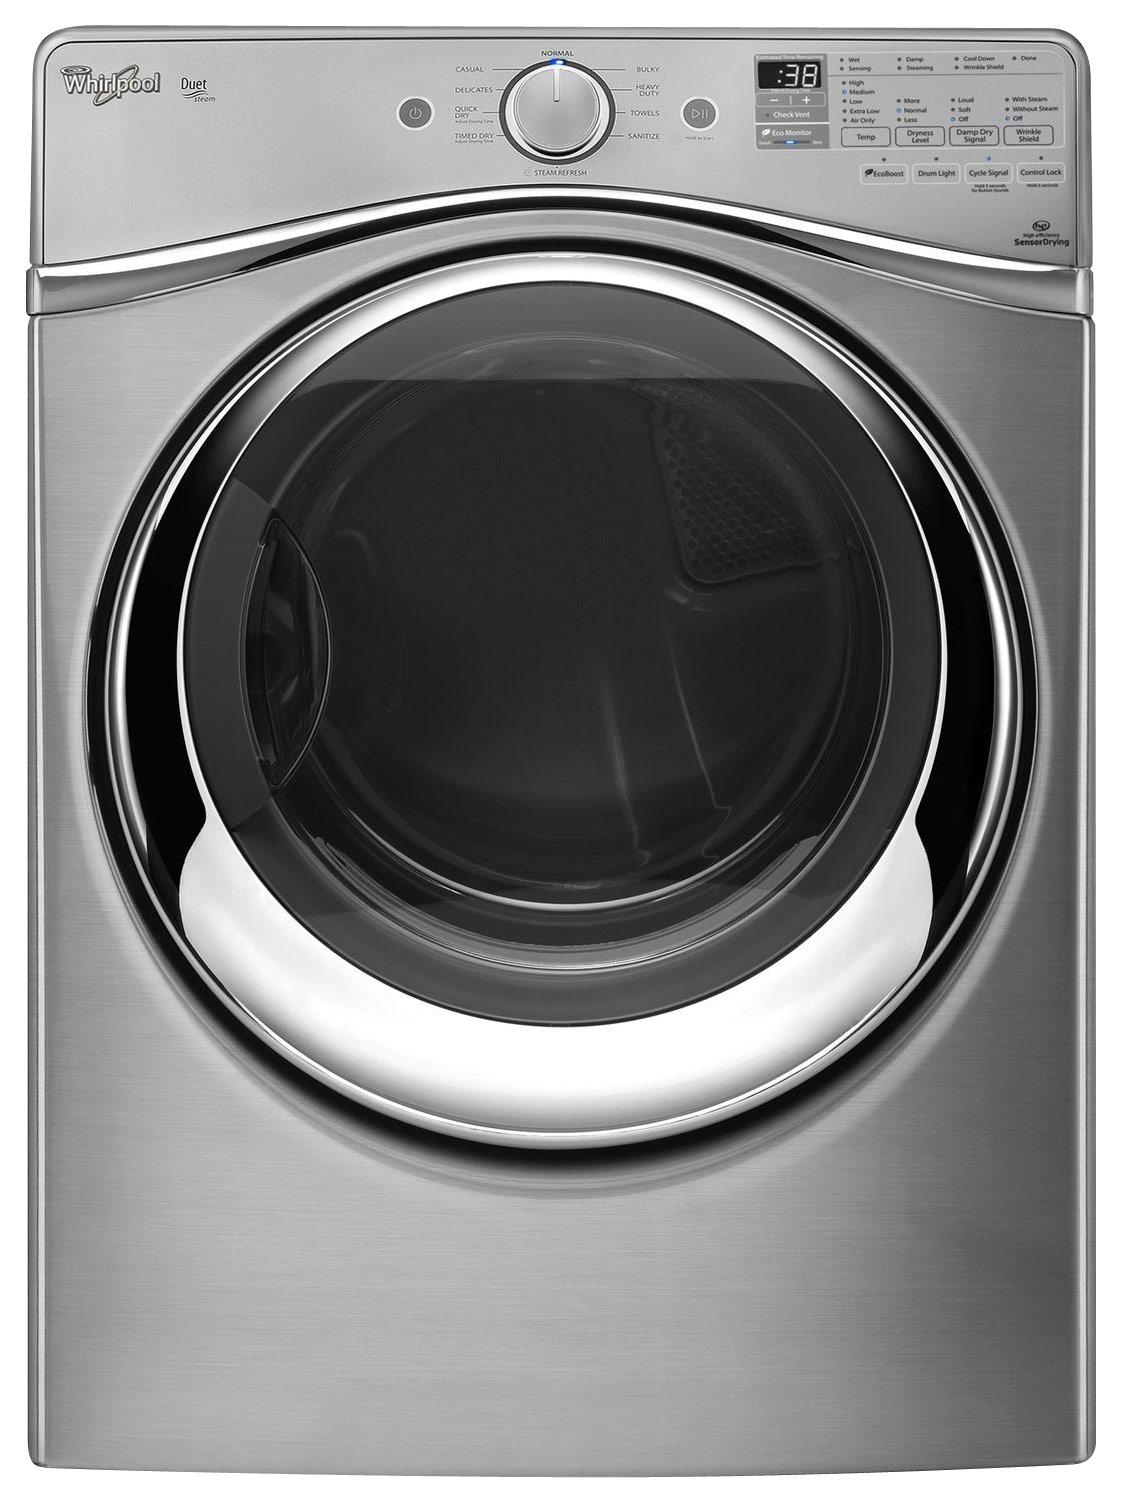 Whirlpool - Duet 7.4 Cu. Ft. 10-Cycle Steam Electric Dryer - Diamond Steel